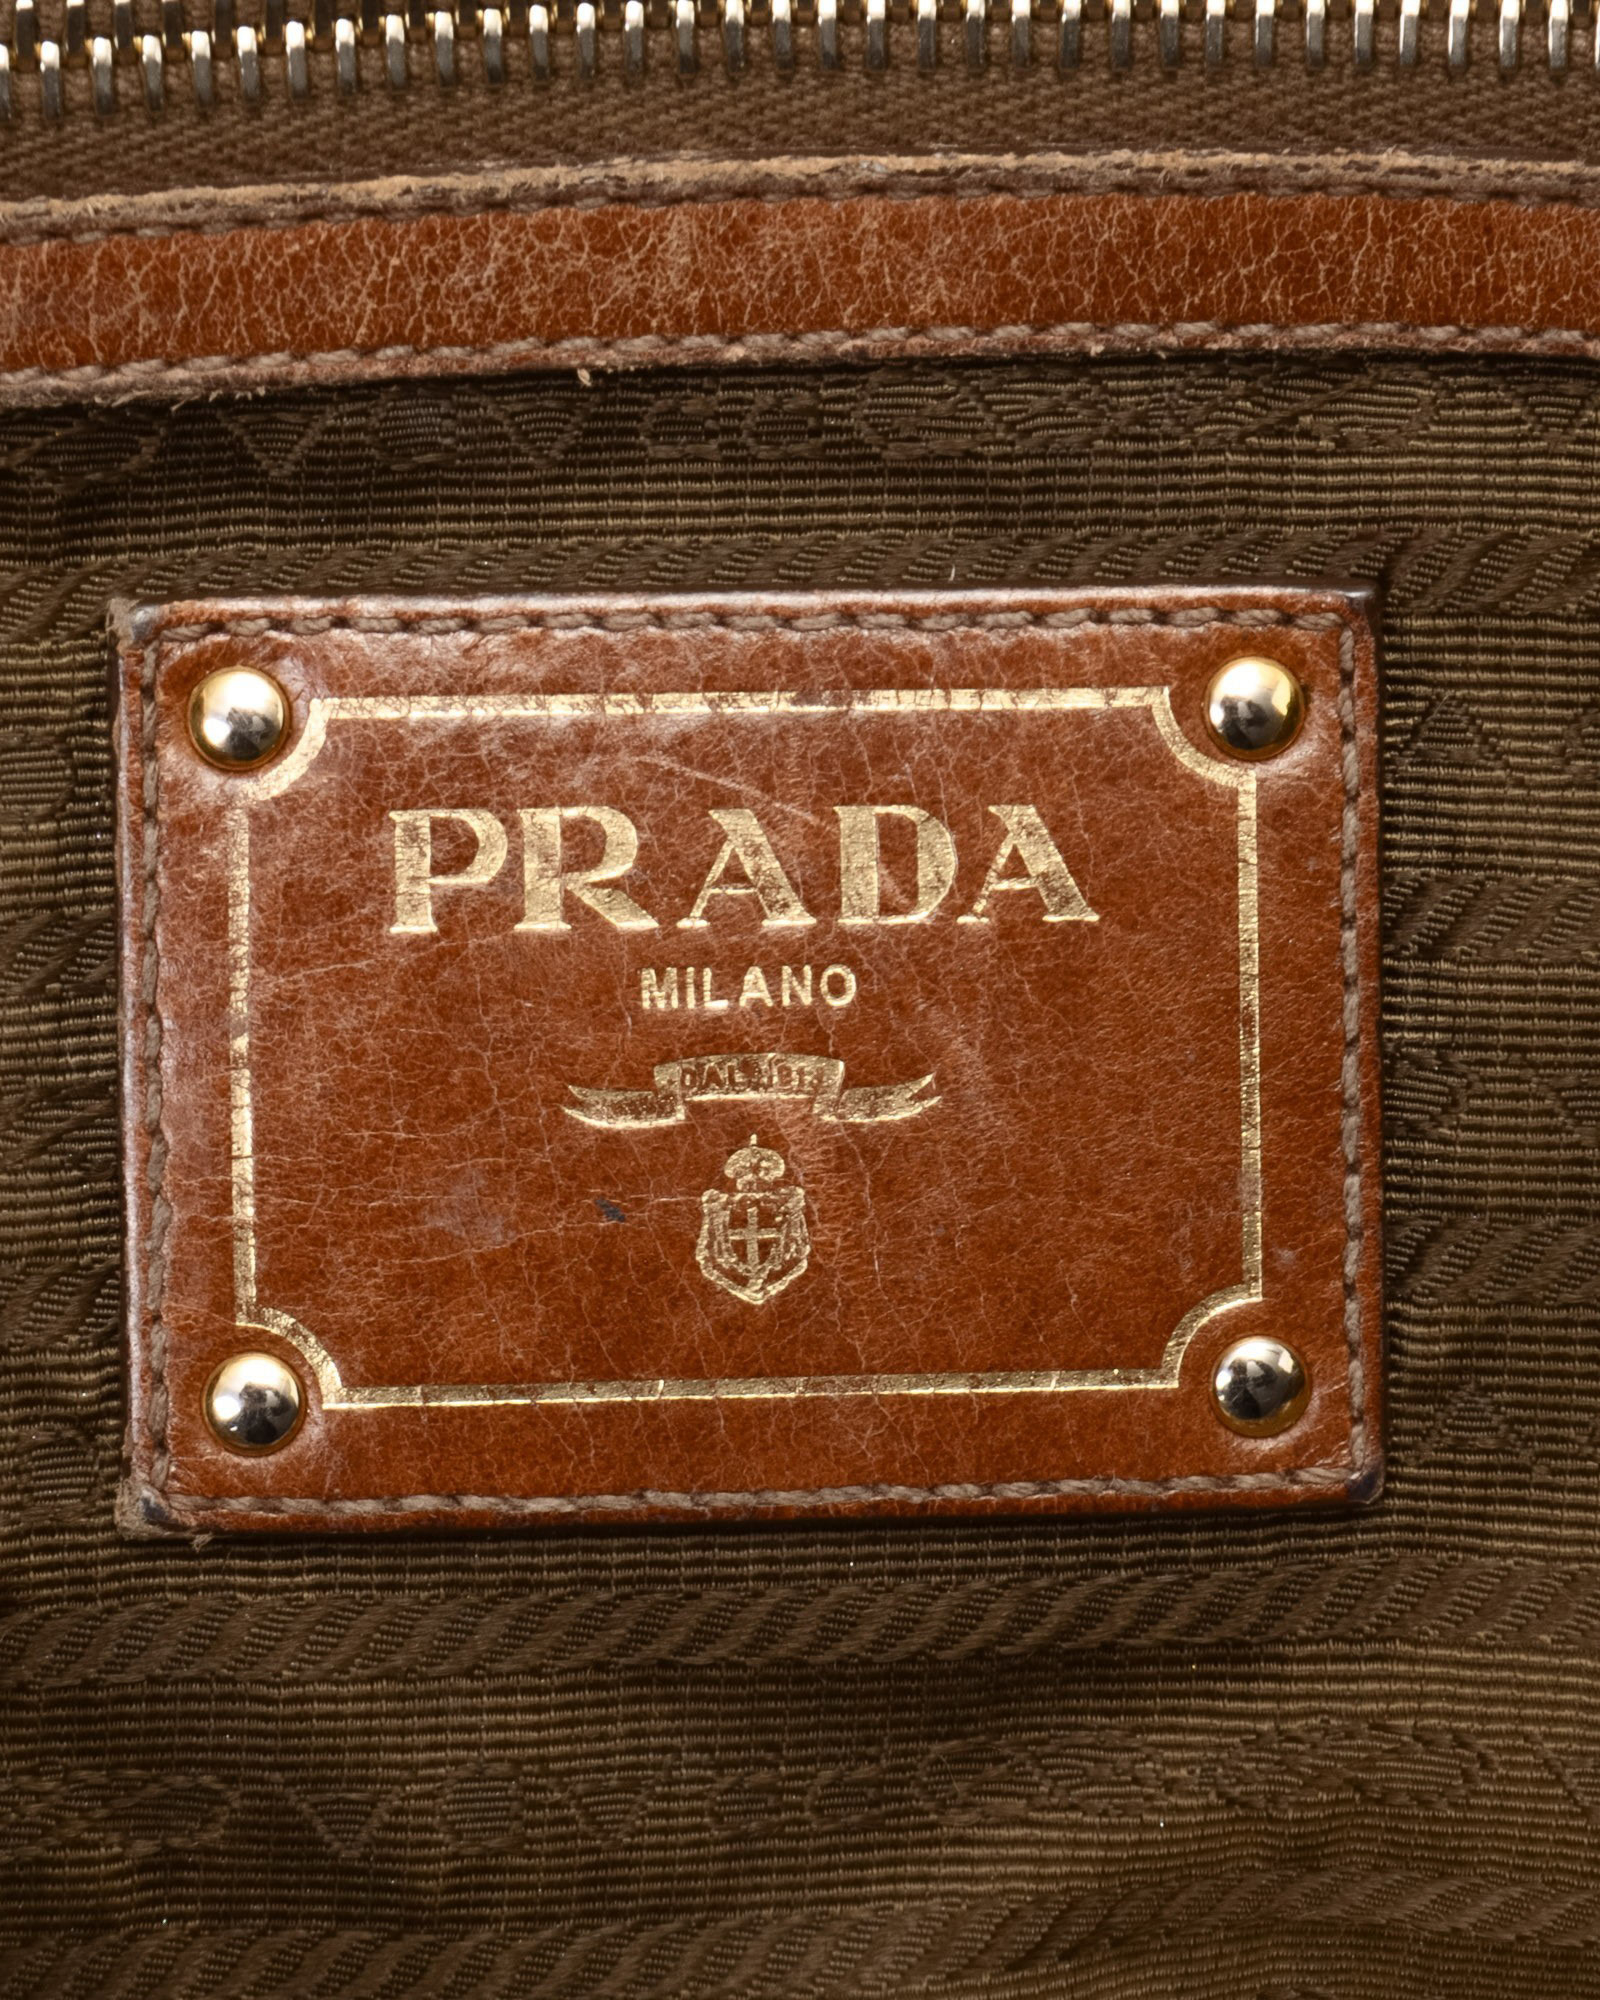 c3858fe23d8a Prada Milano Purse Brown Leather - Best Purse Image Ccdbb.Org